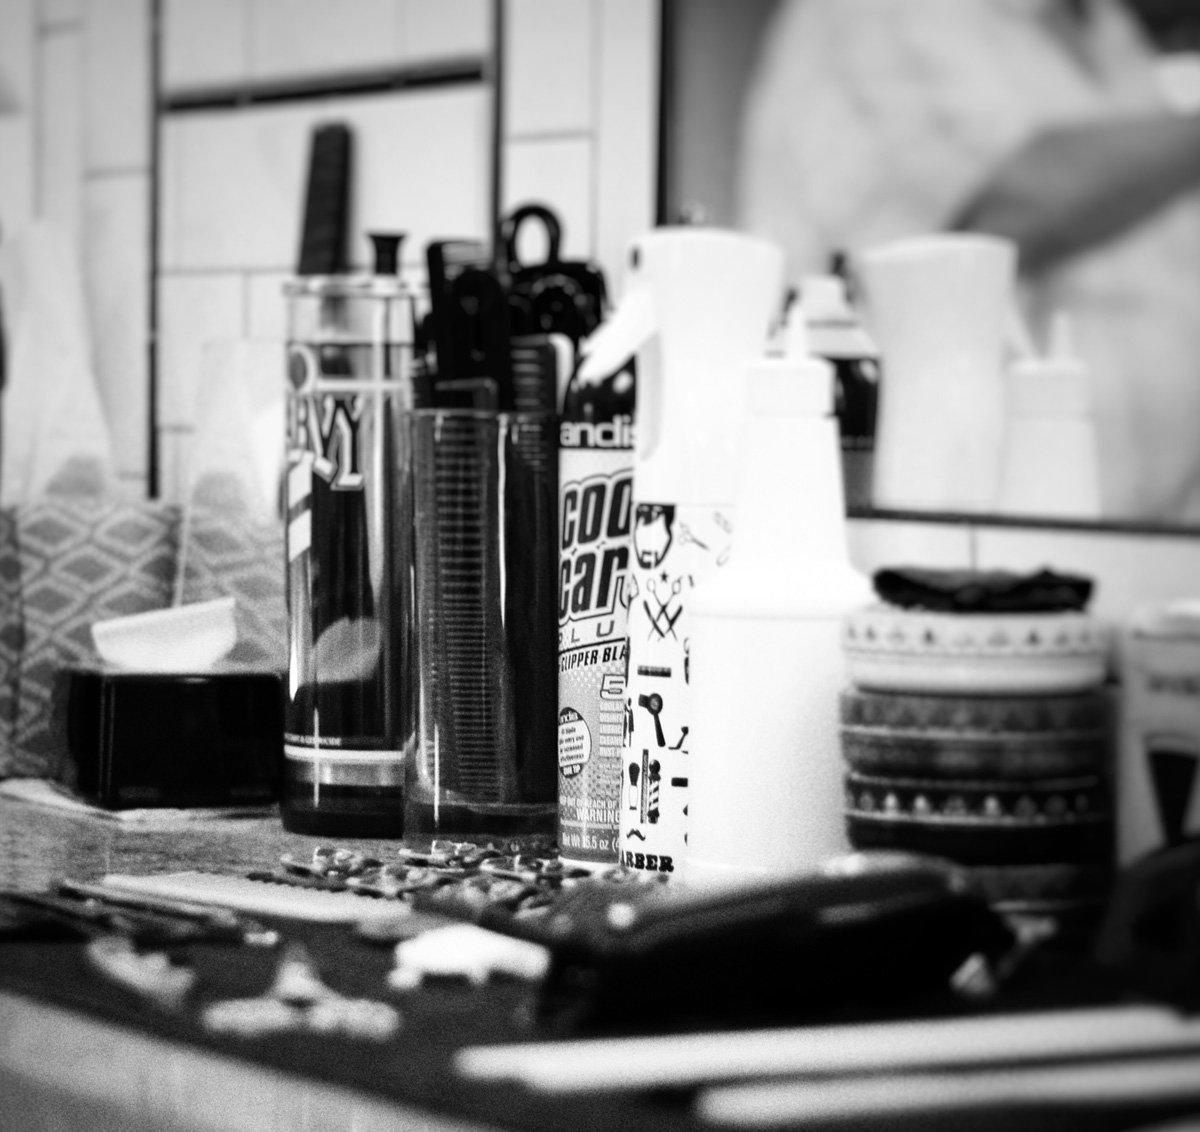 gent's classic barbershop menomonee falls wisconsin counter tools and product hairspray gel